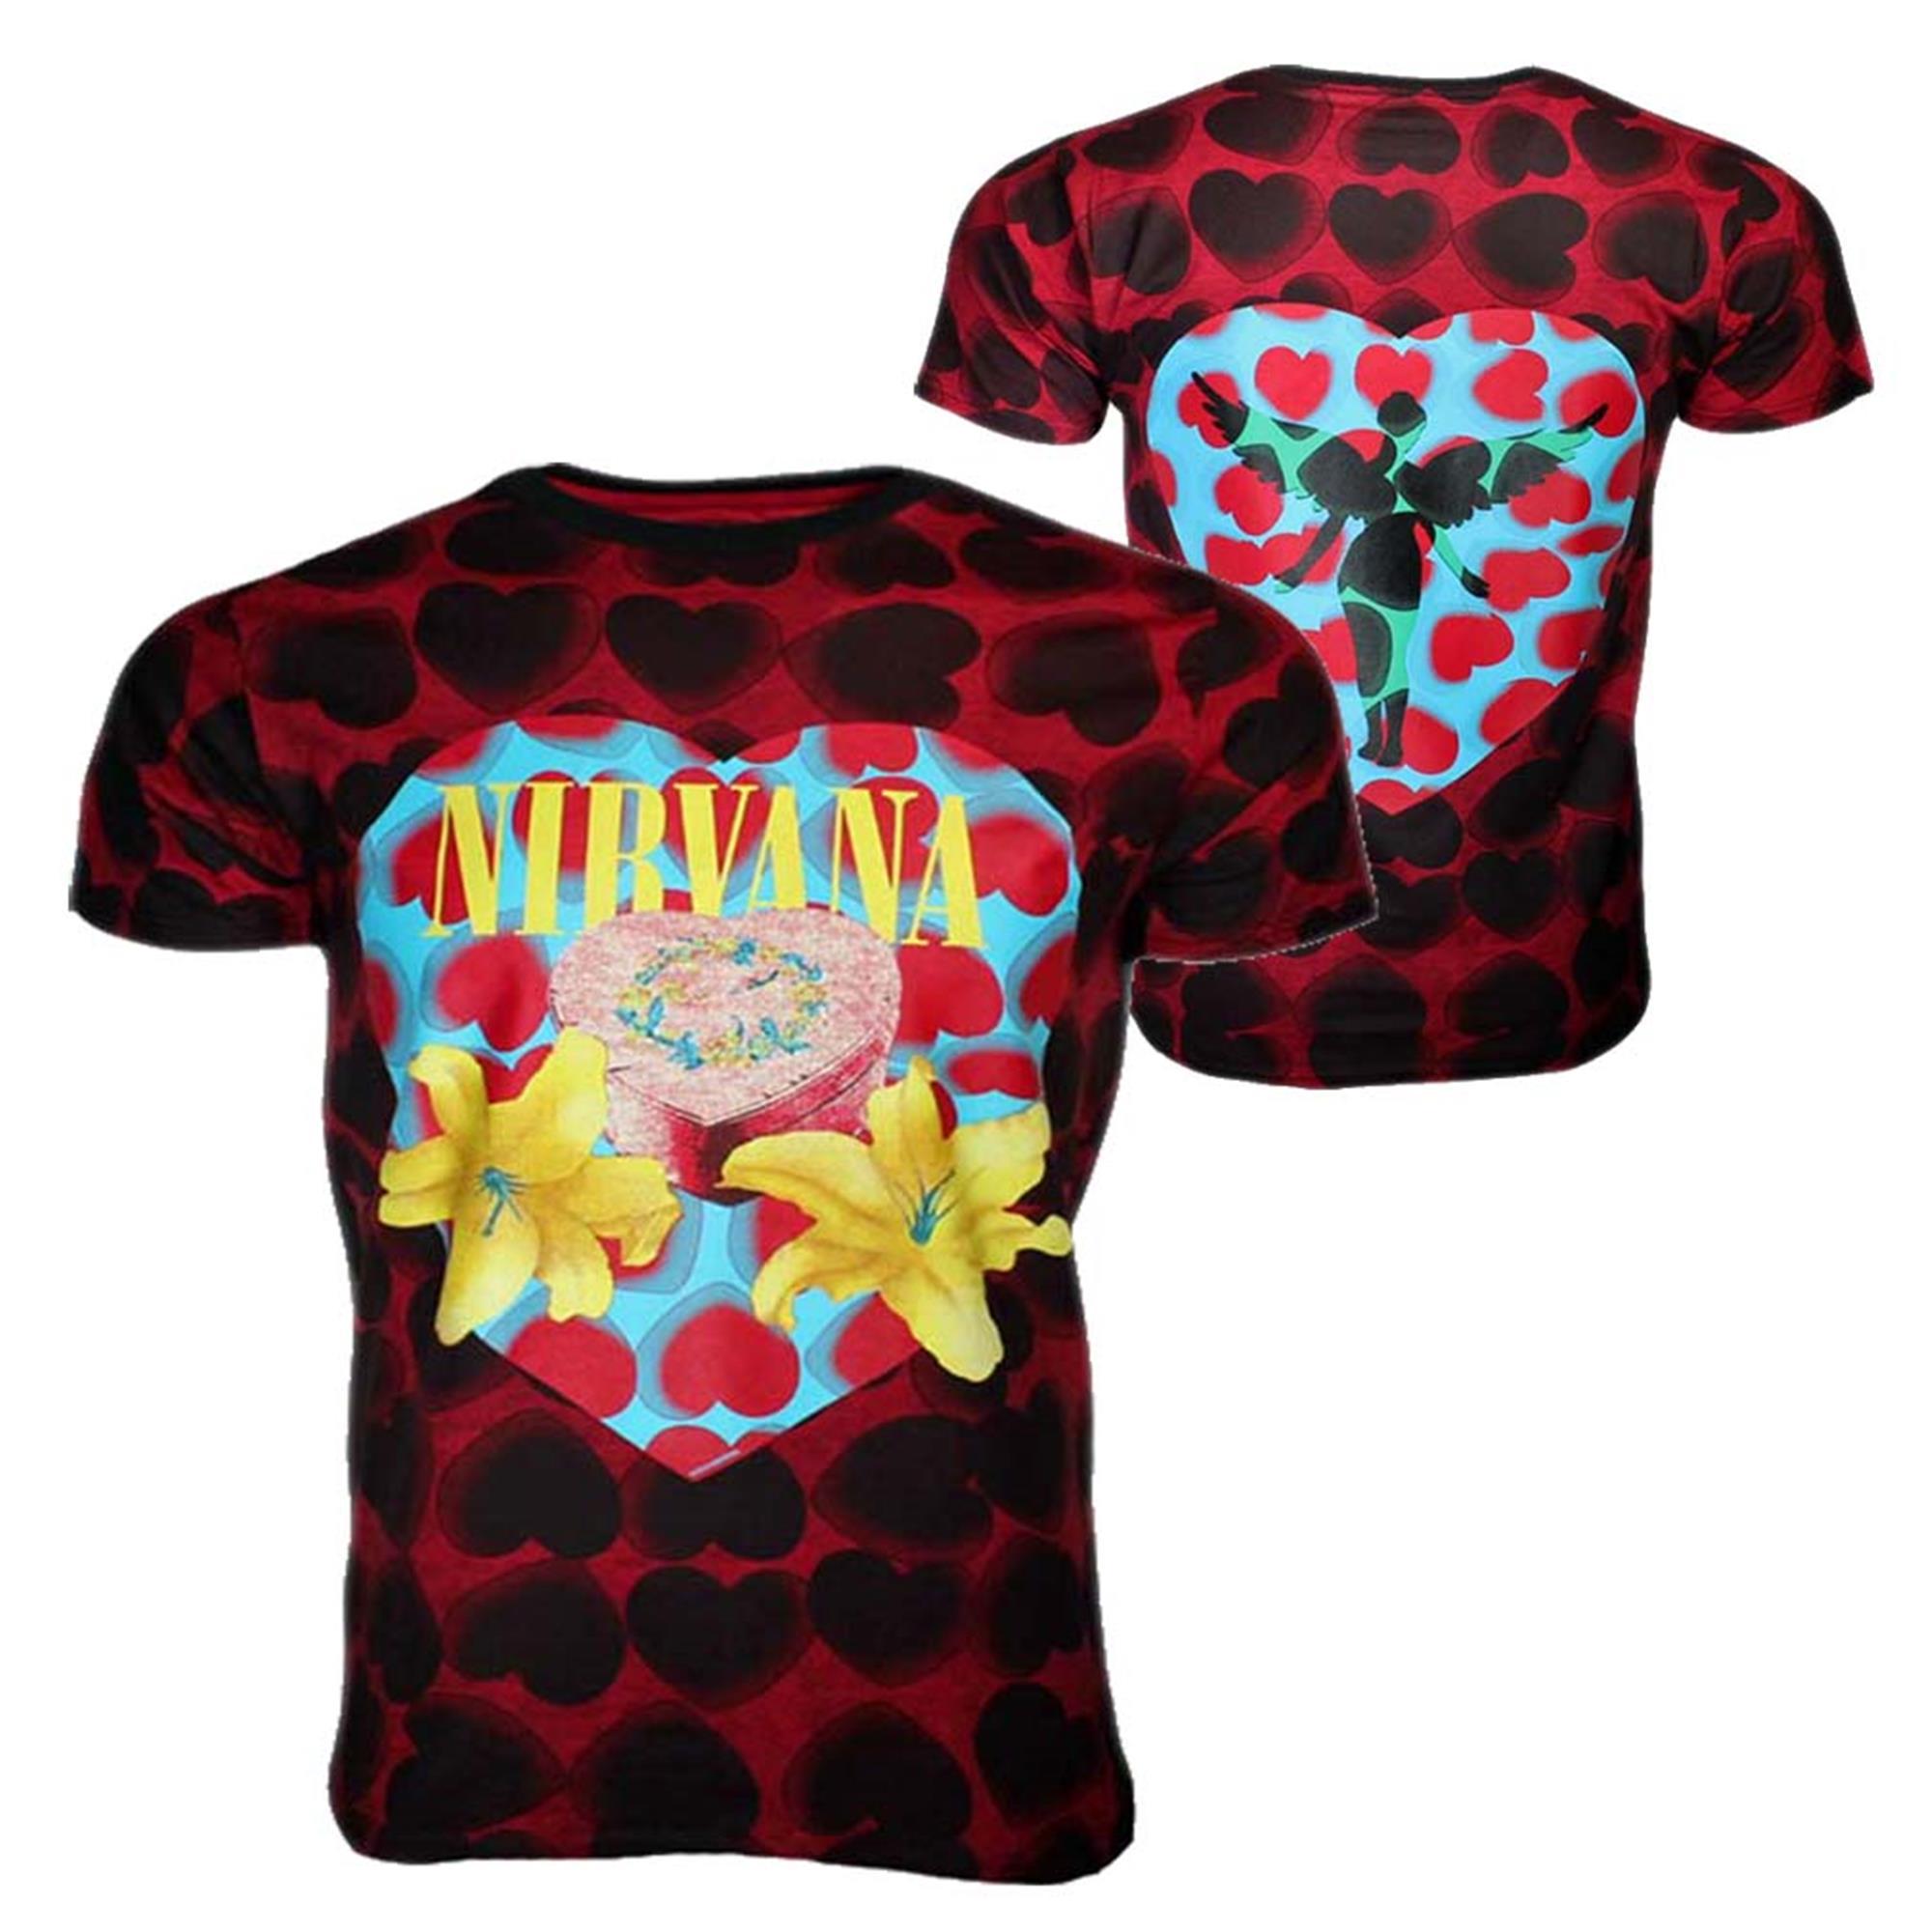 Nirvana Heart Shaped Box Men's Dye T-Shirt